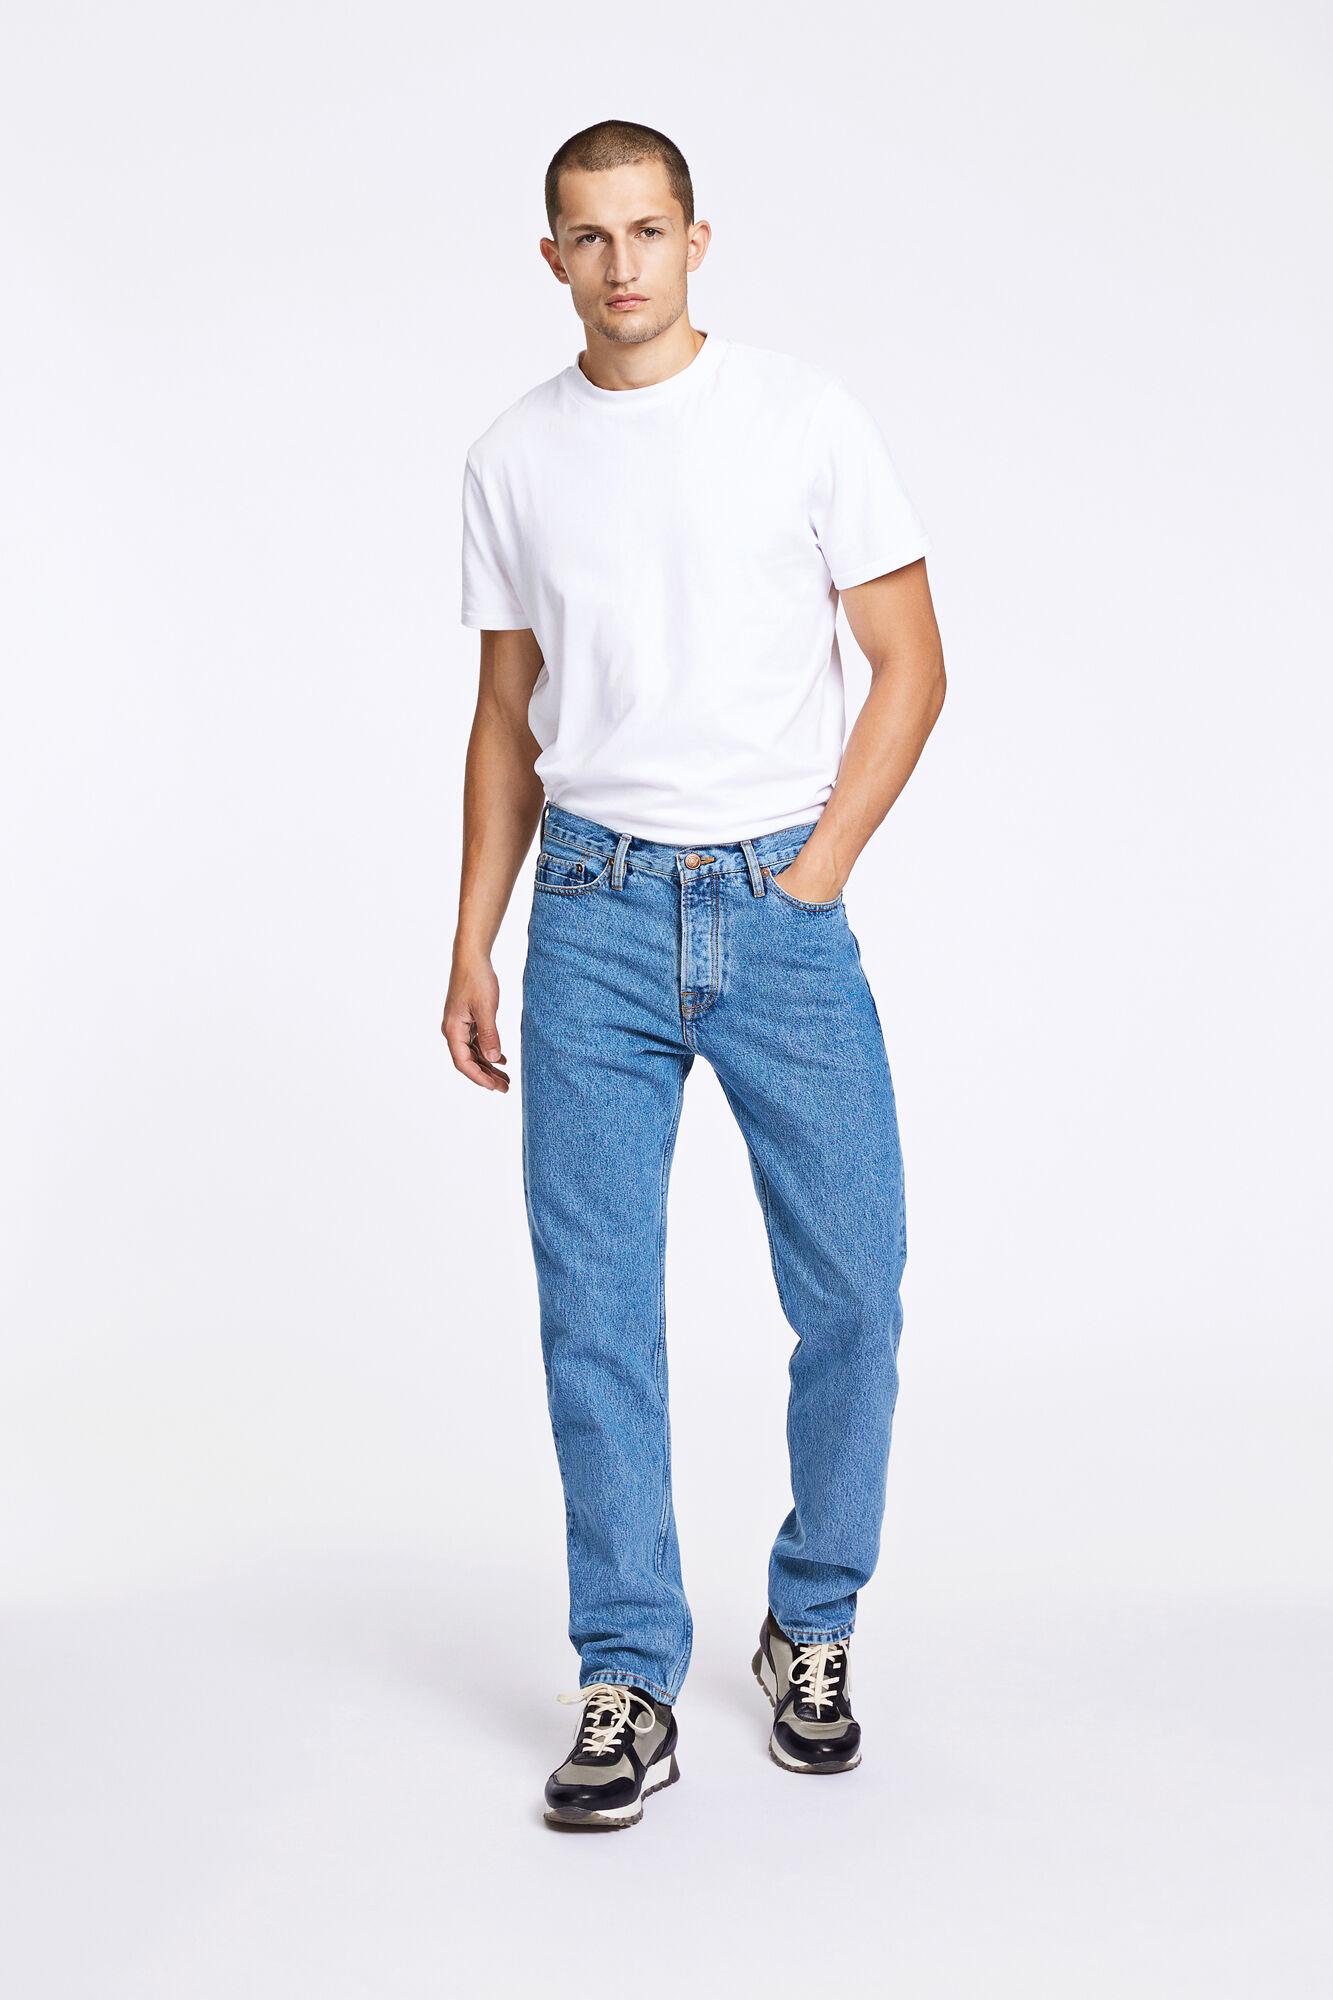 Kurt jeans 8159